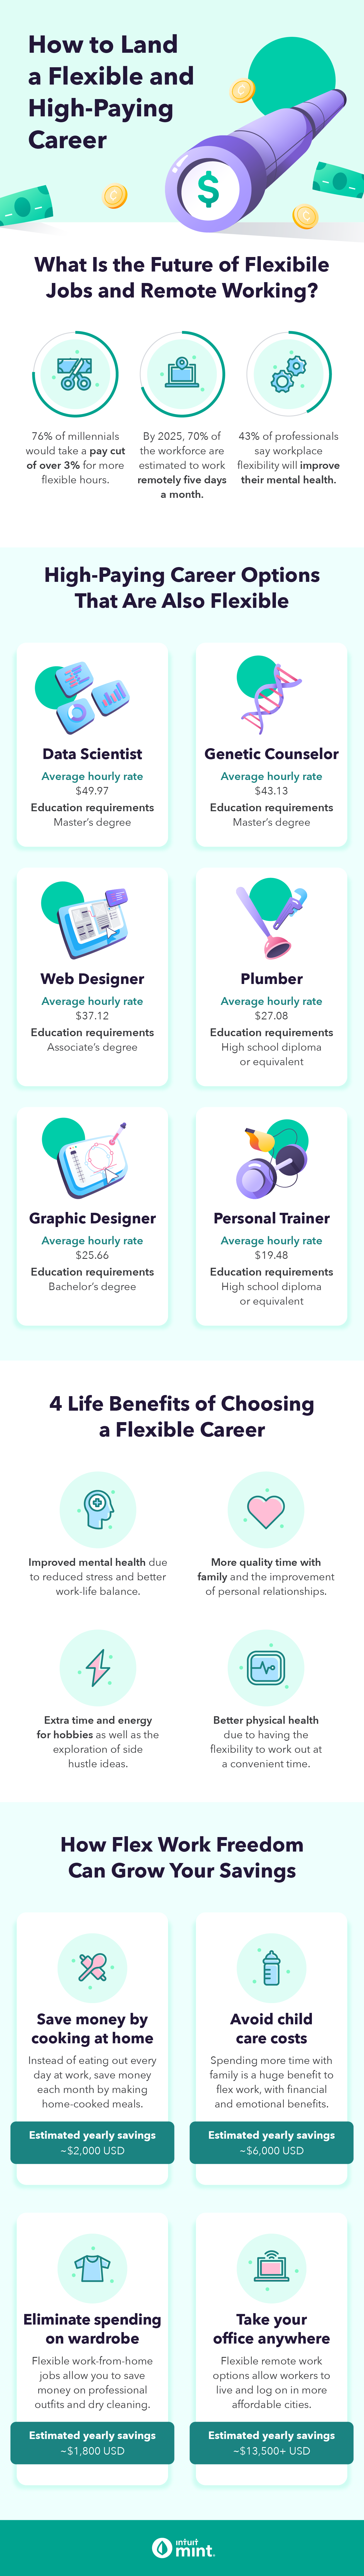 flexible-job-high-paying-career-V2